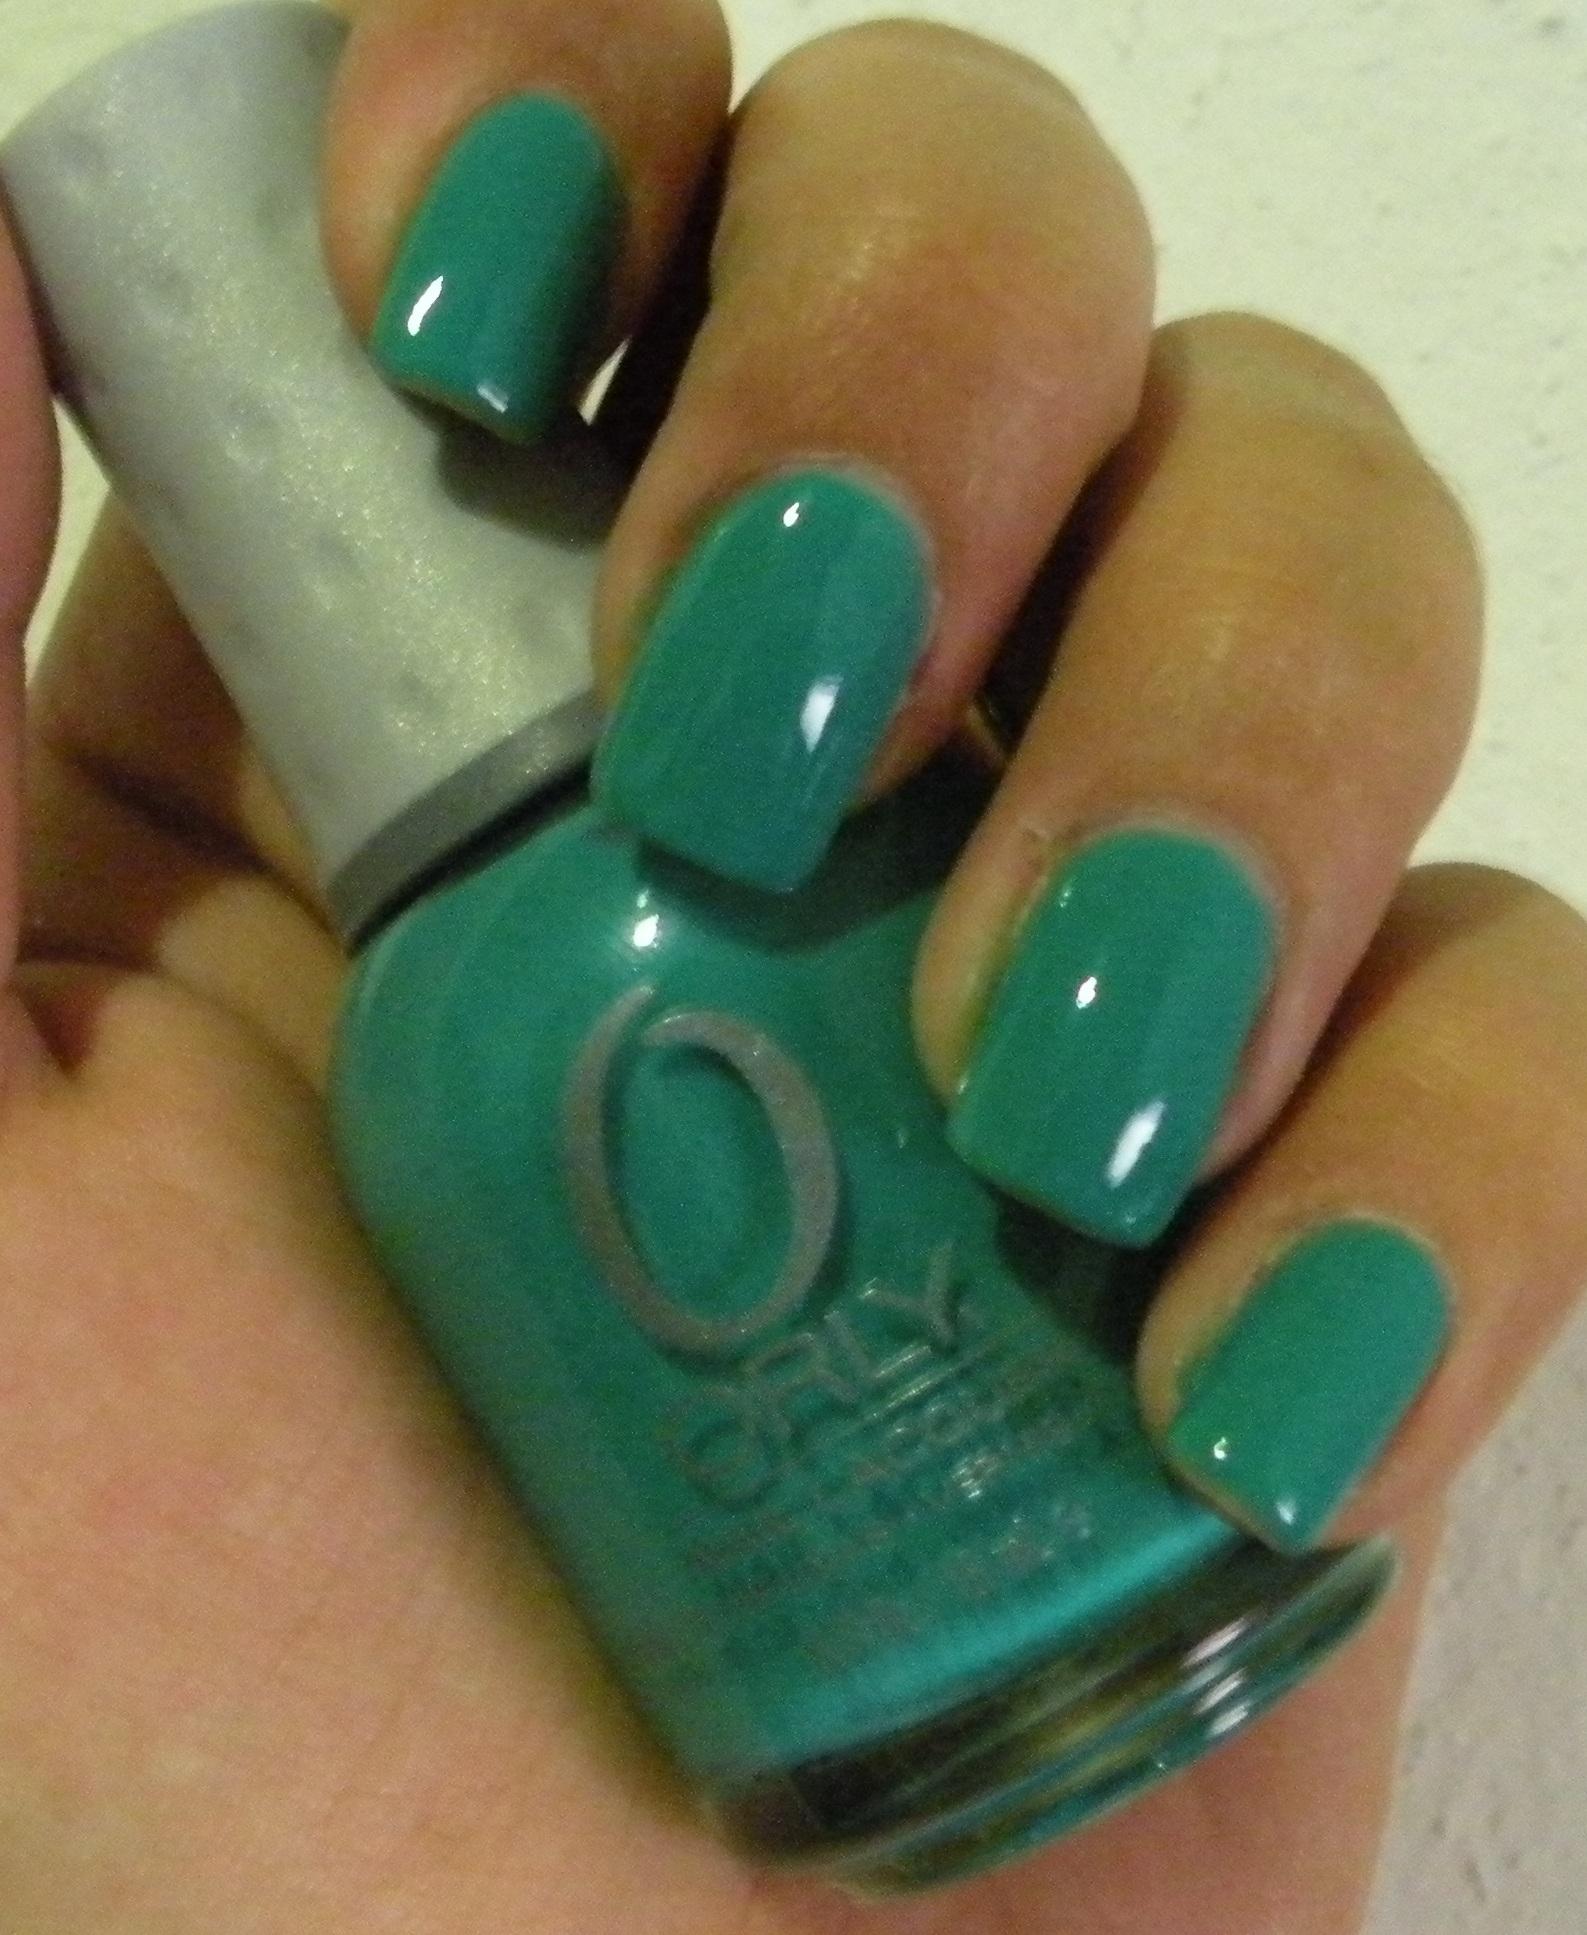 nail polish | AleLifeStyle | Página 3